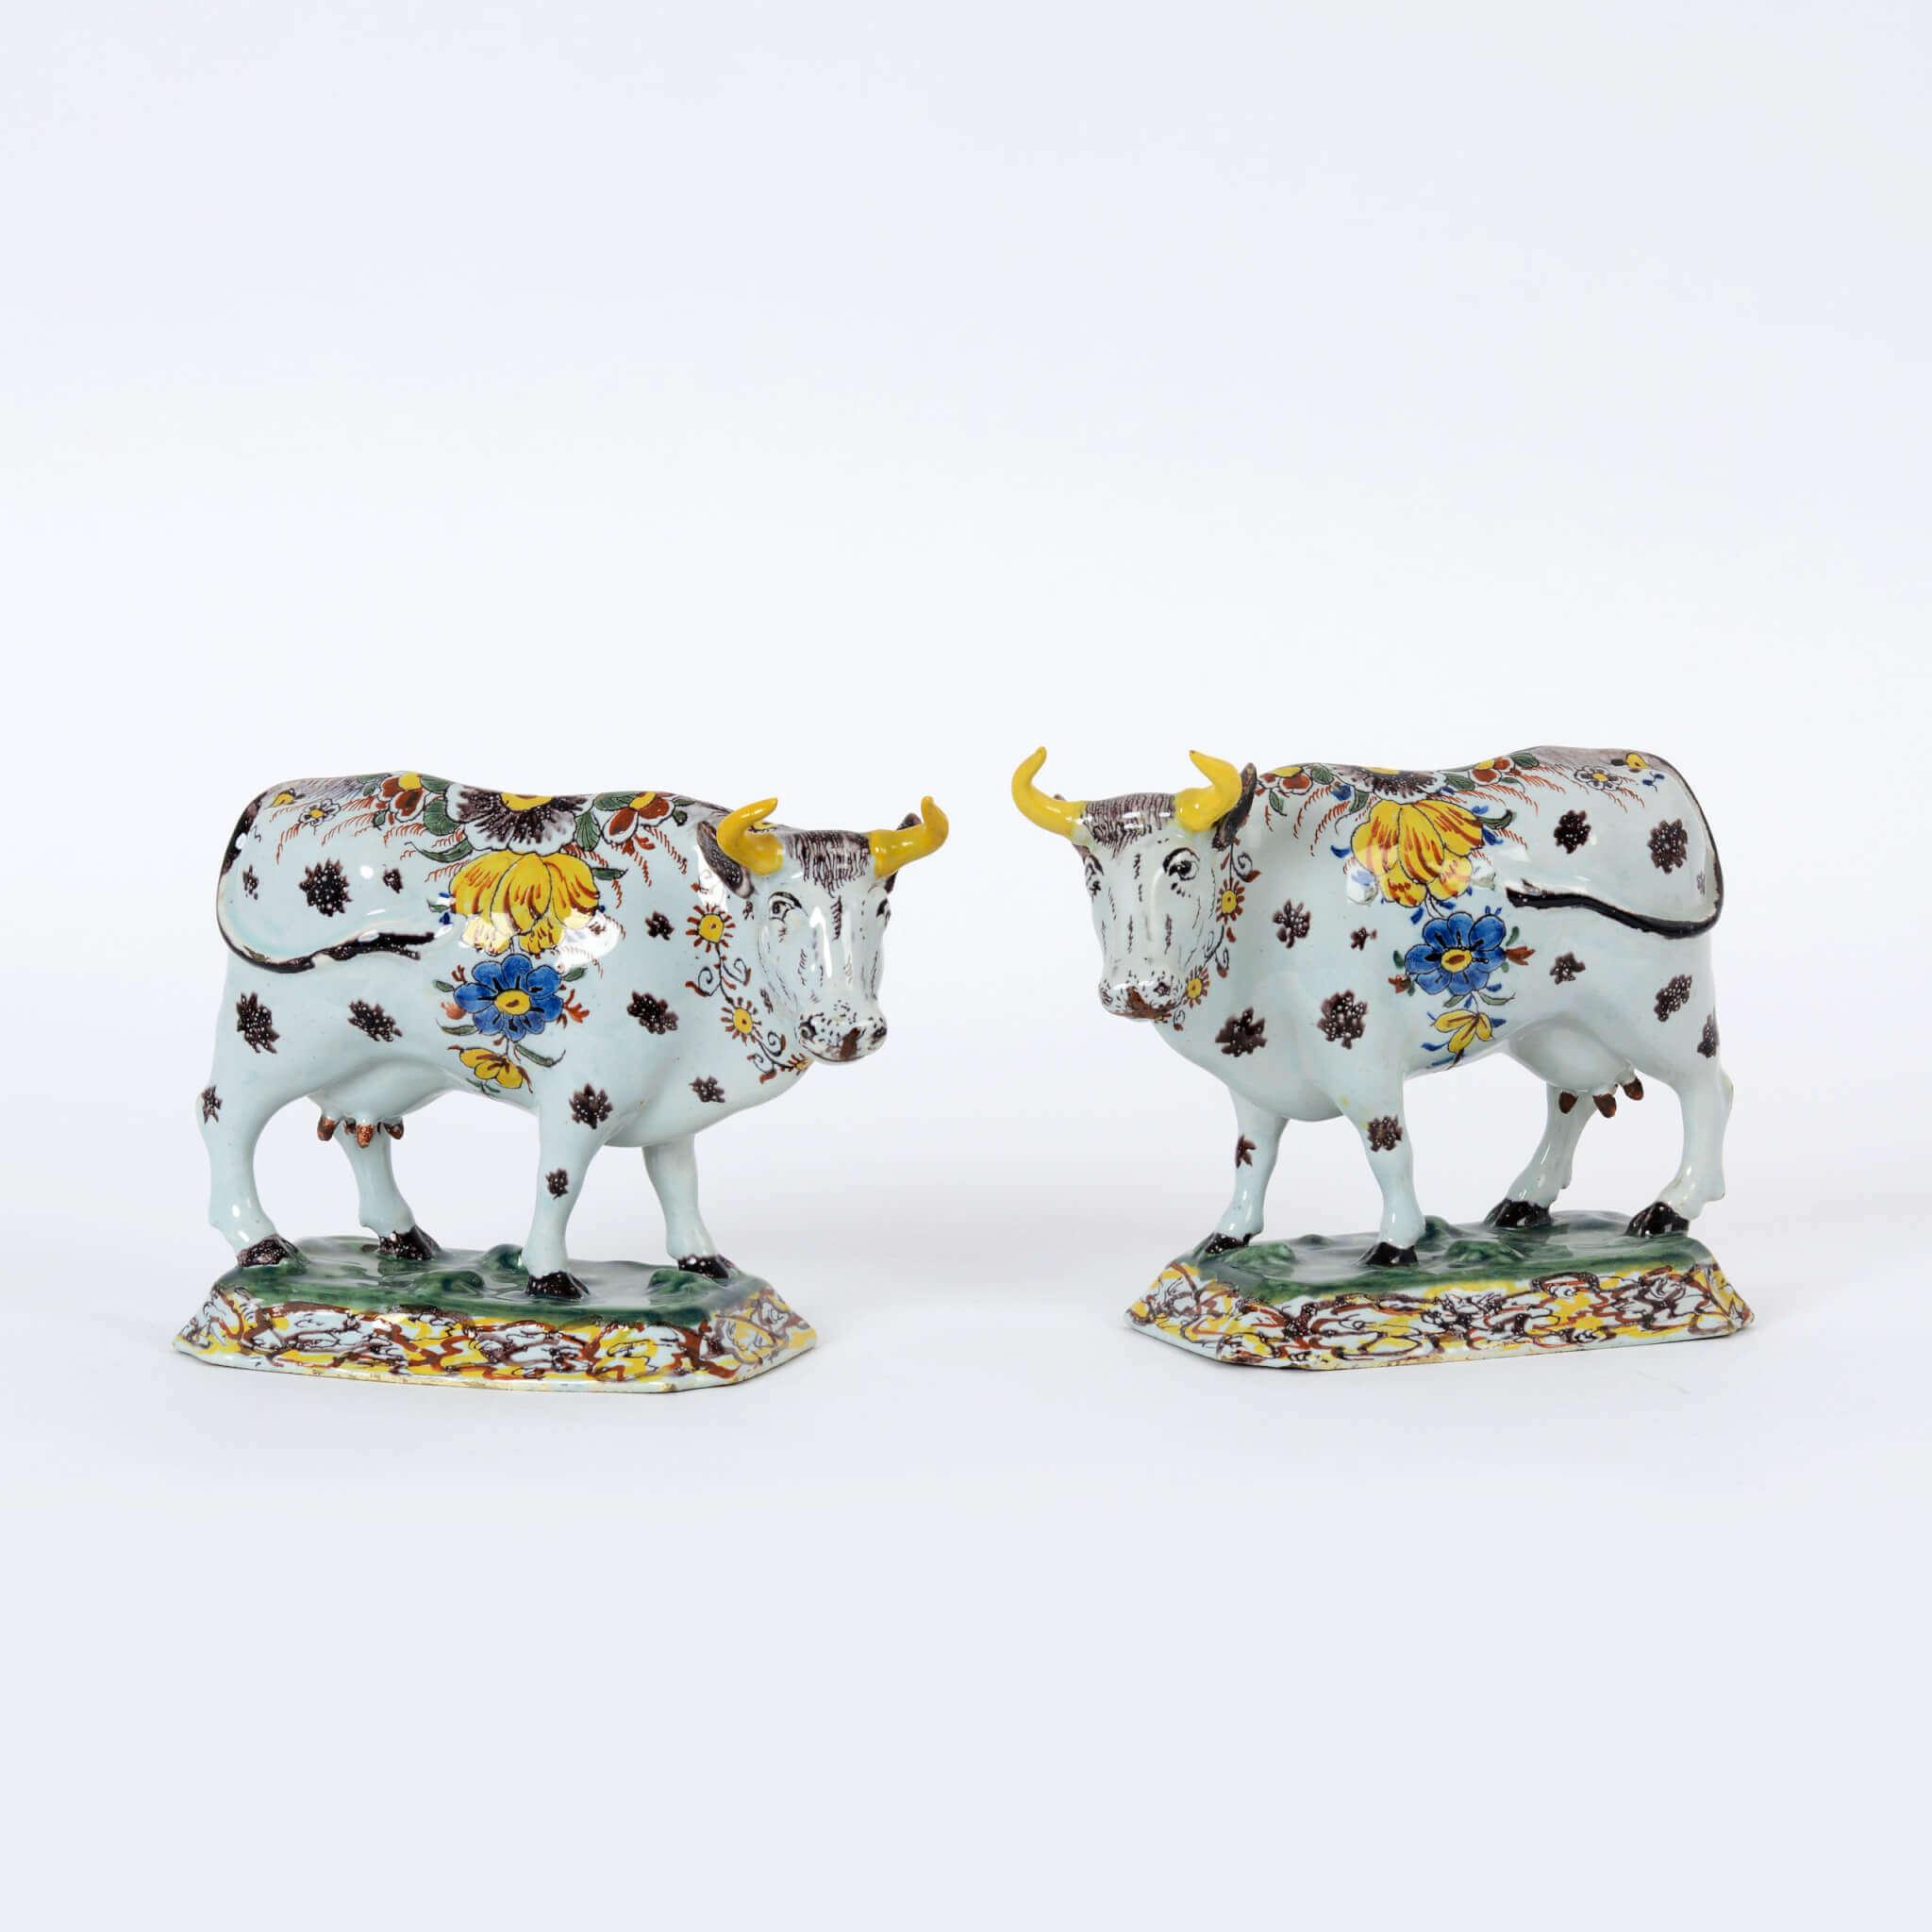 Polychrome Delftware cows